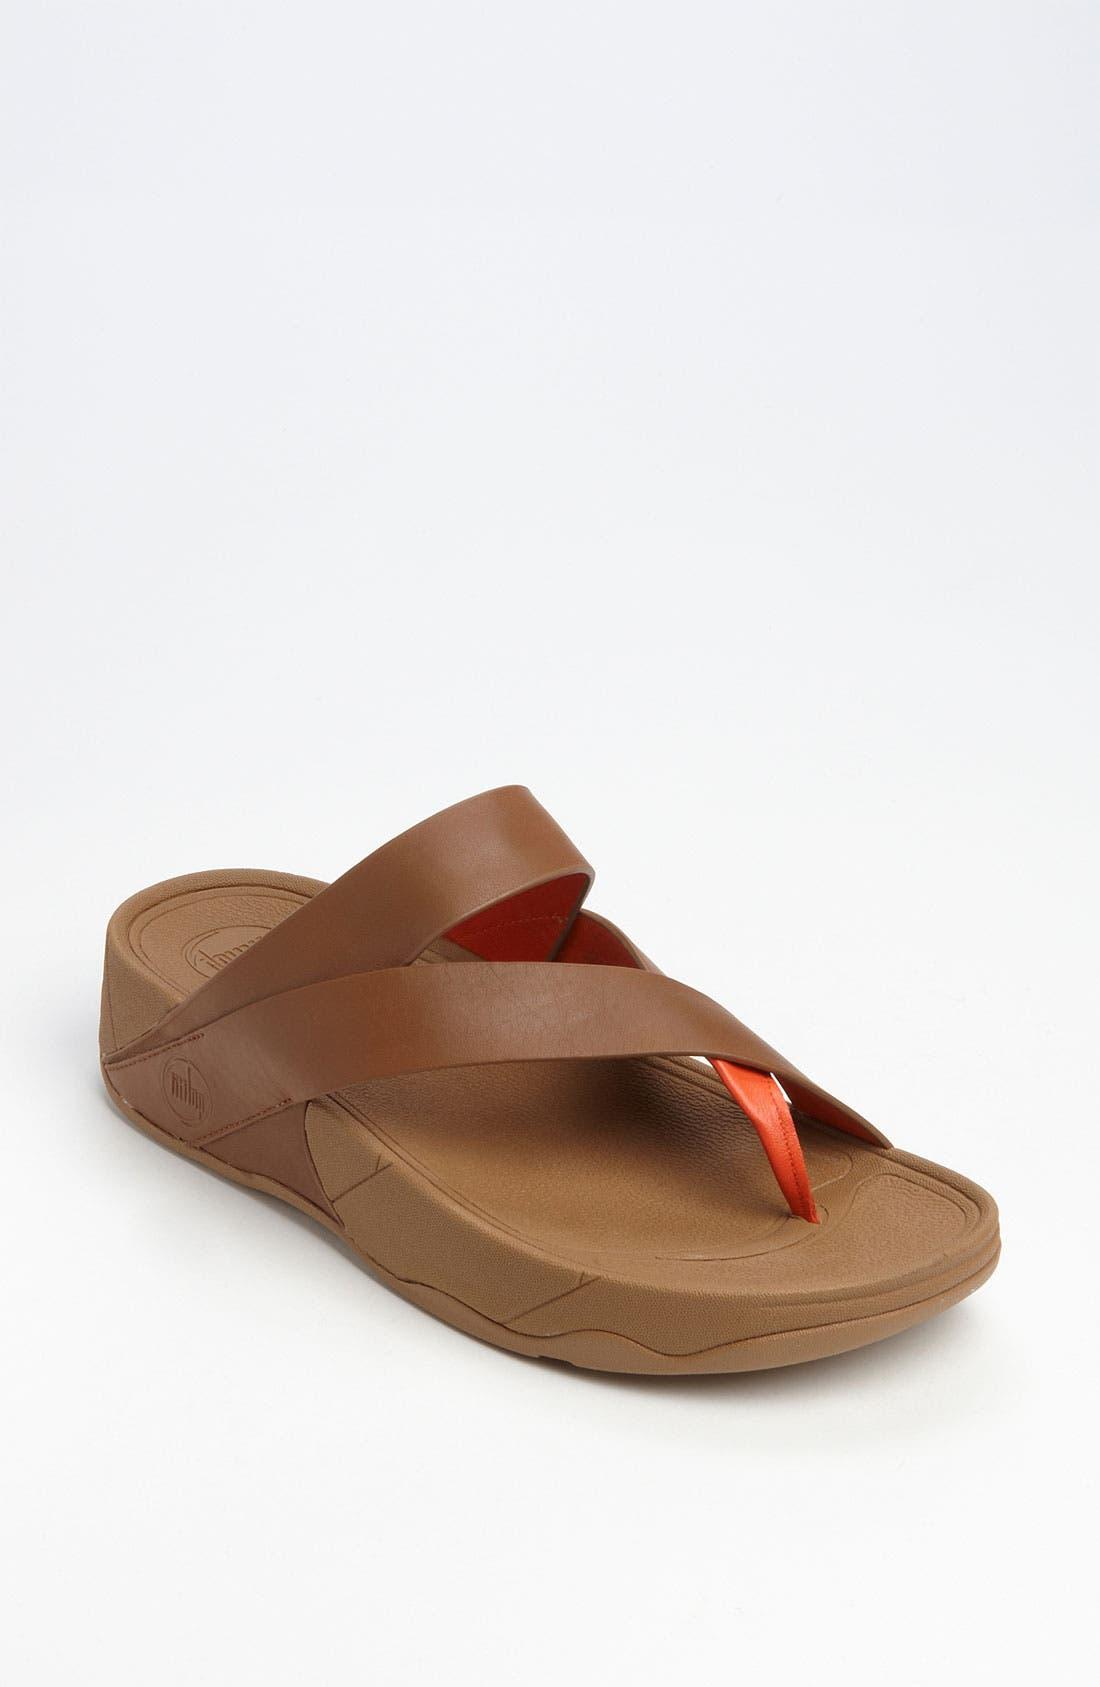 Main Image - FitFlop Sling Sandal (Women)